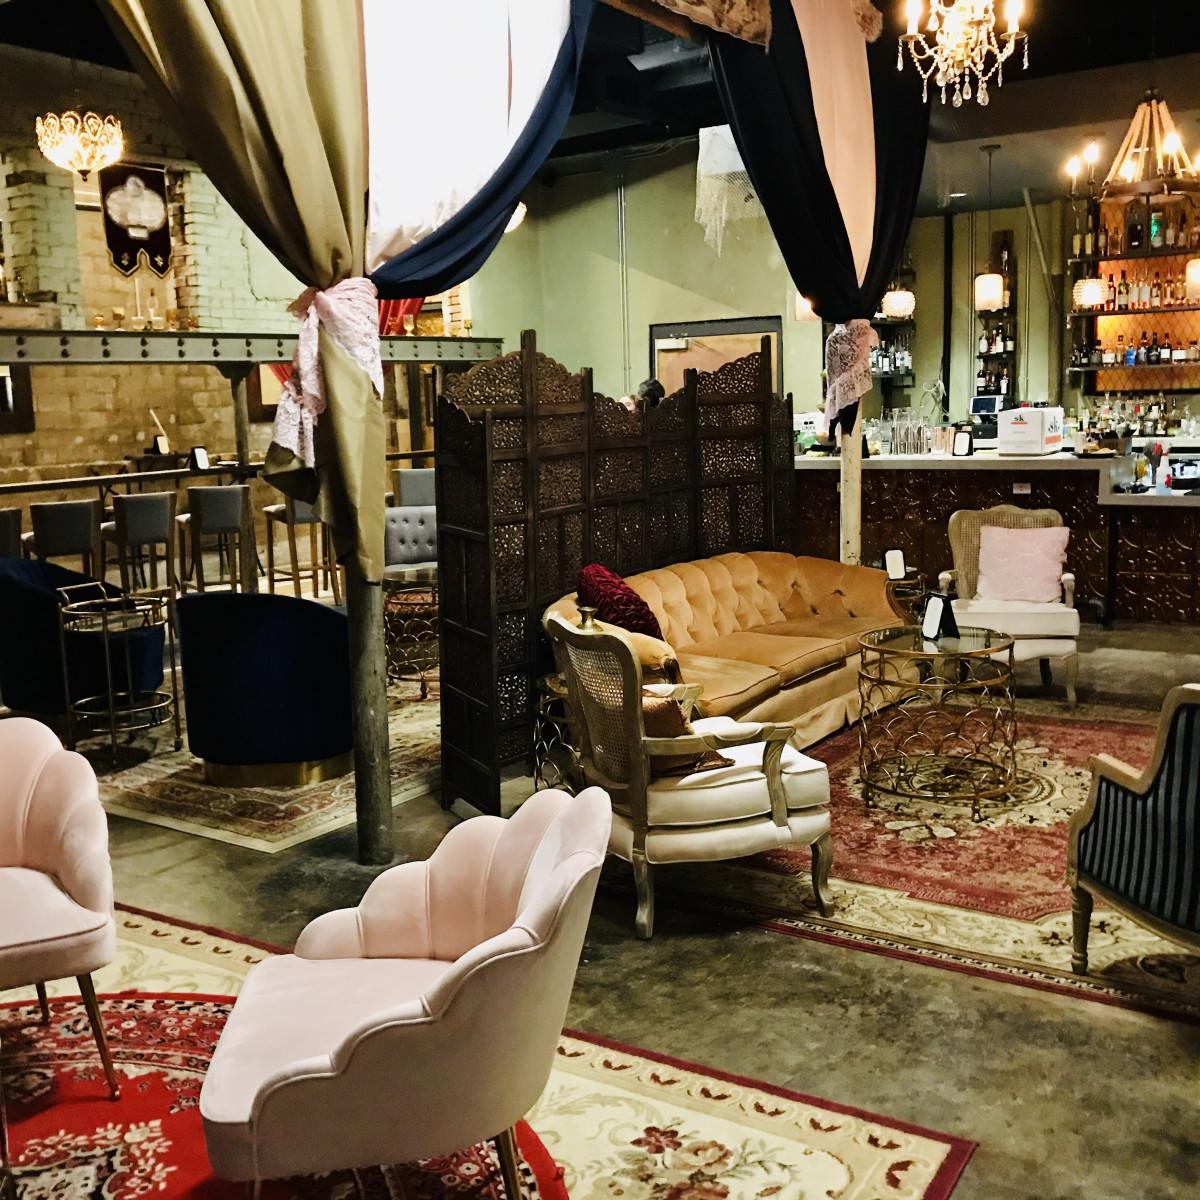 The Amber Room, Wishbone & Flynt